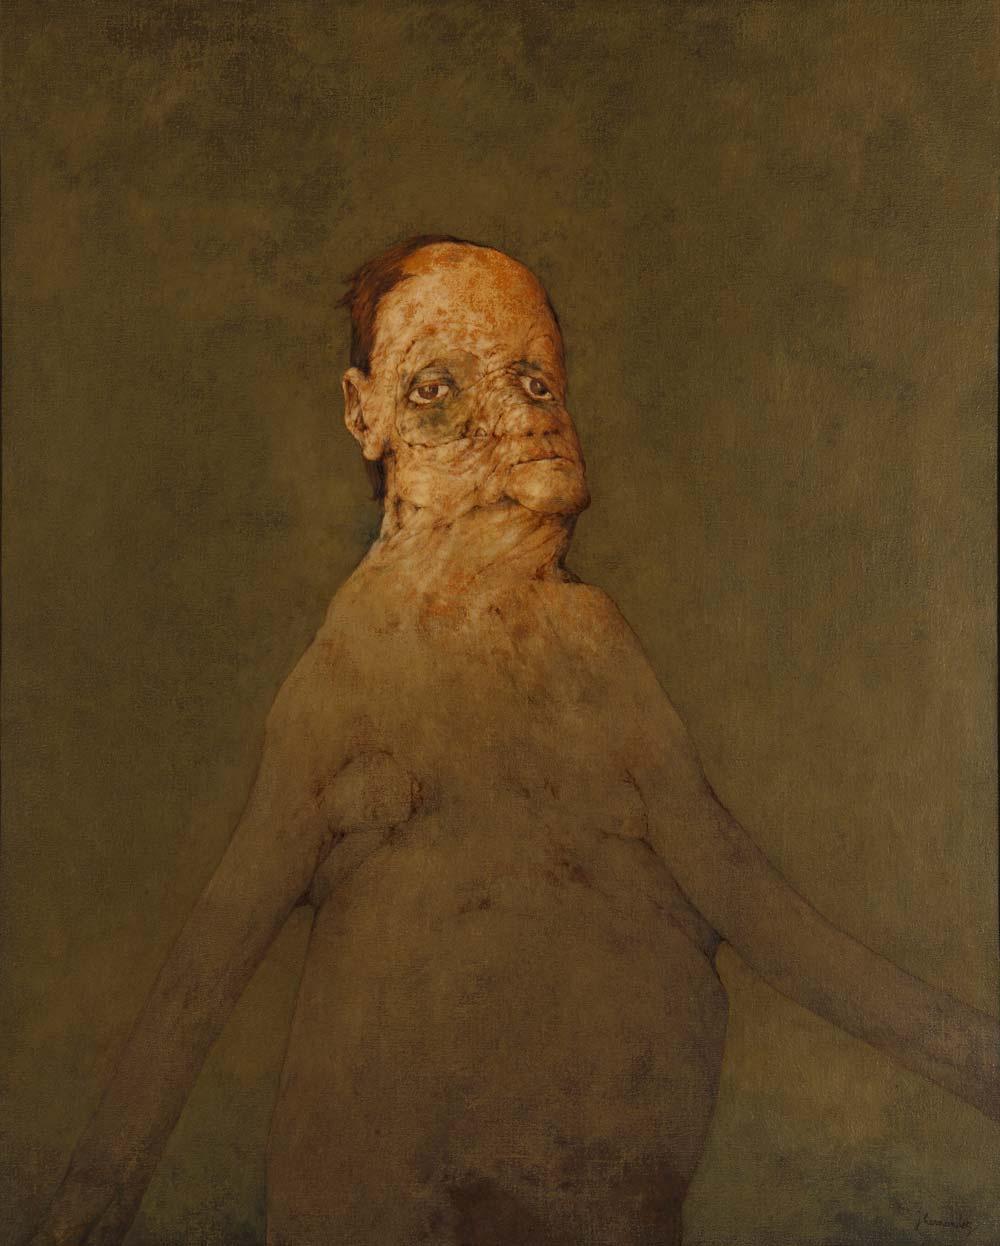 Jose Hernandez. Archetype III